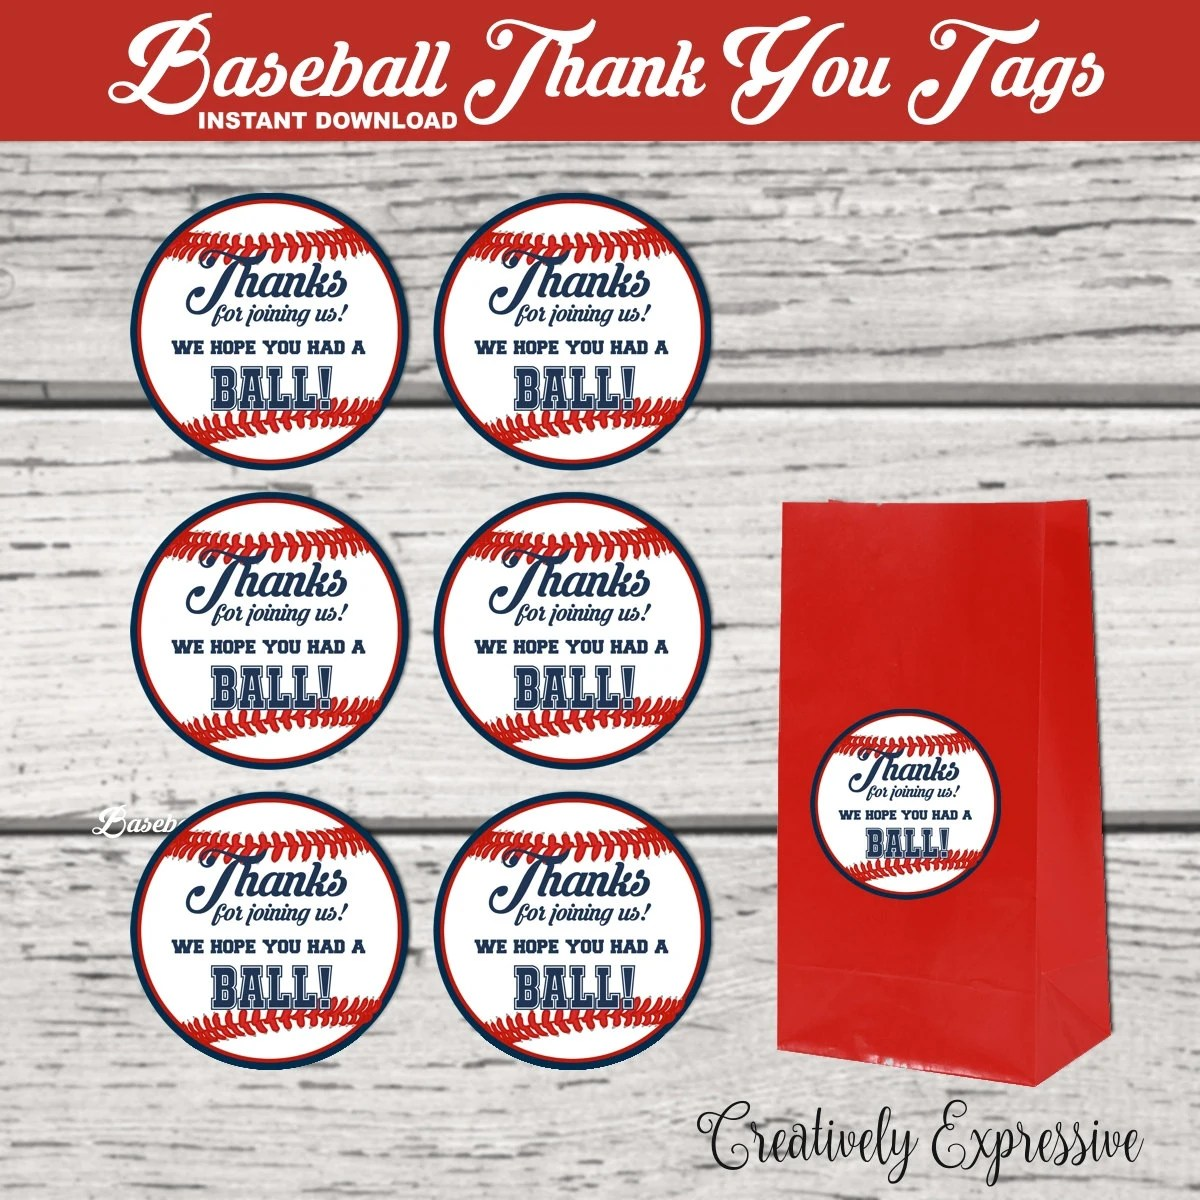 Baseball Party Baseball Thank You Tags Baseball Party Favor Tags